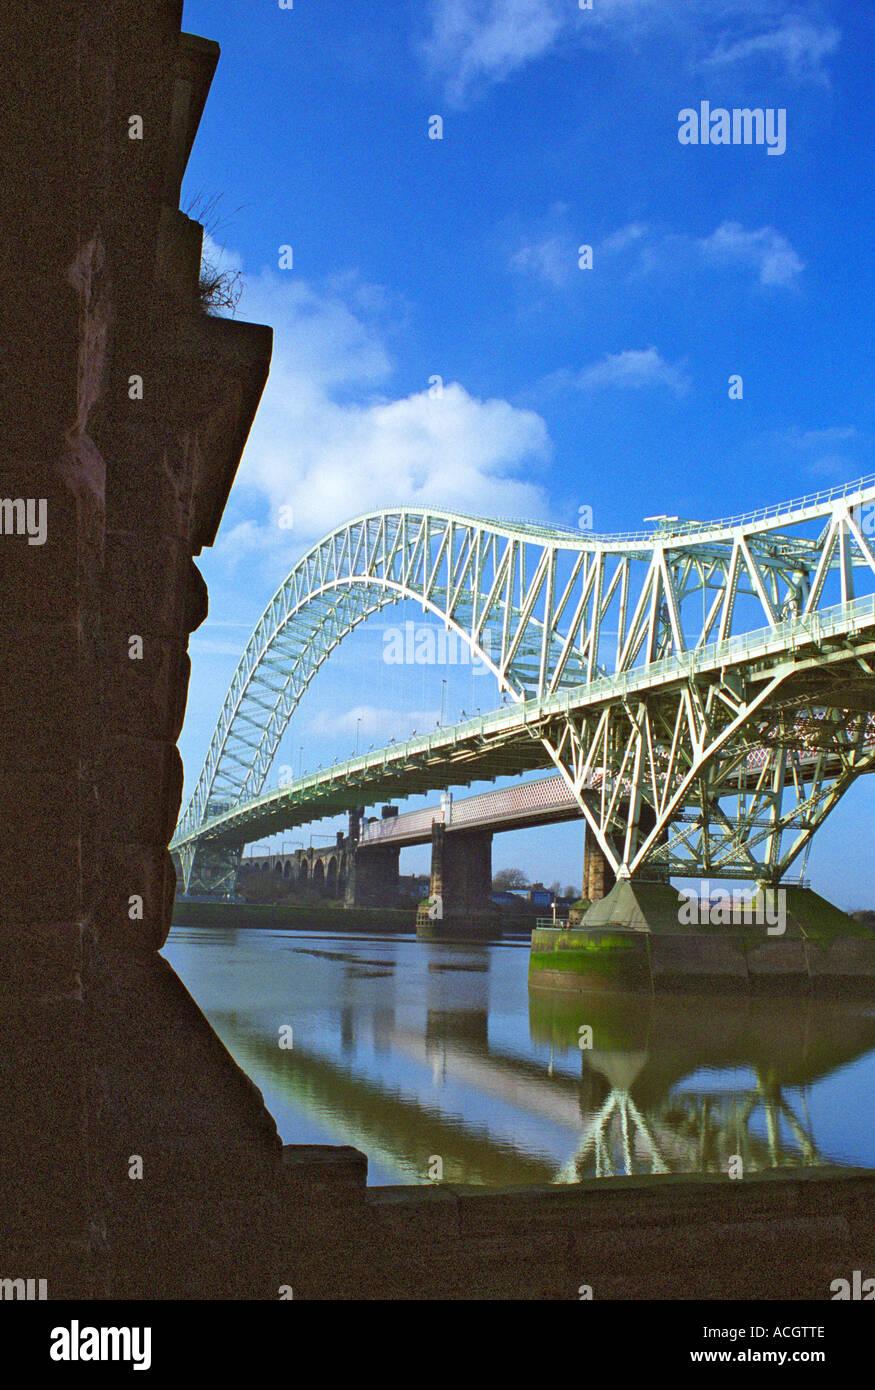 Runcorn-Widnes Road Bridge (The Silver Jubilee Bridge) from  Widnes West bank, England Feb 2006 - Stock Image